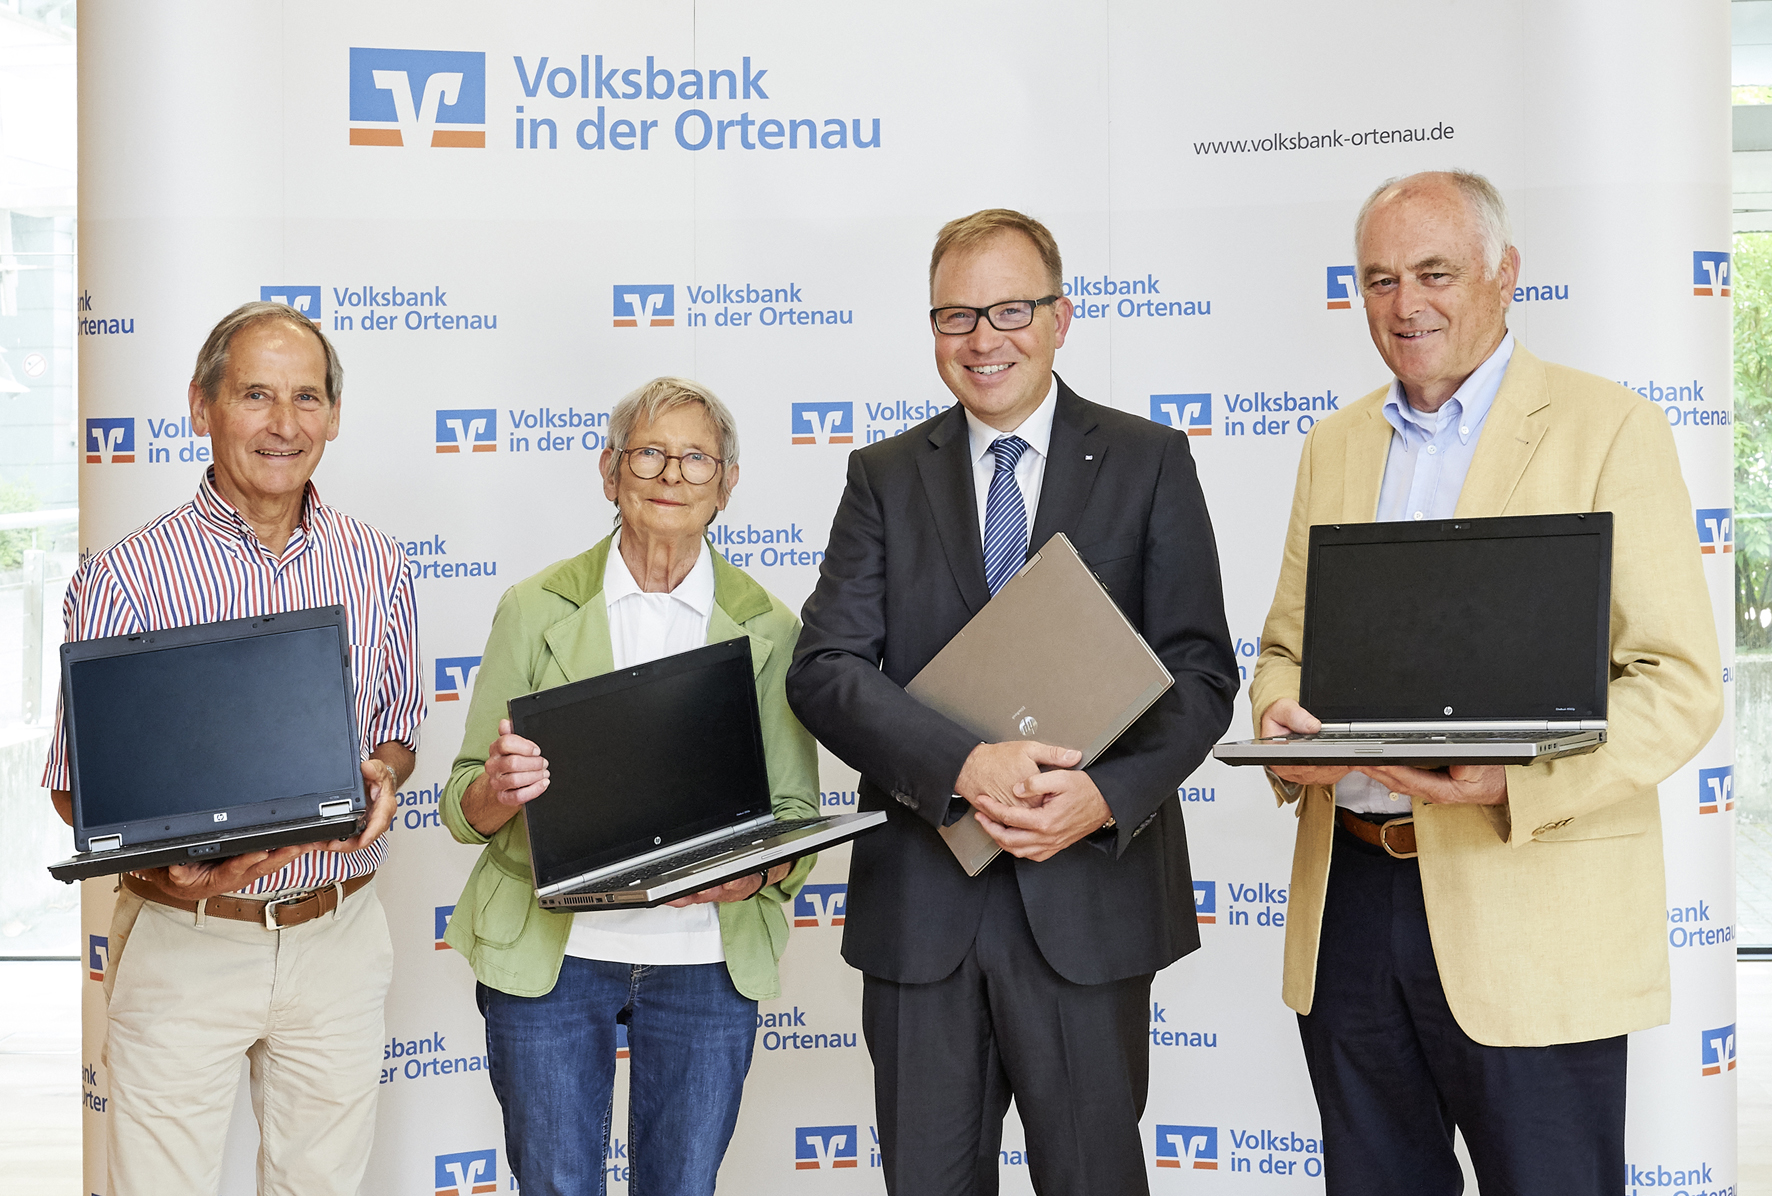 Laptop Tafel Bank : Laptopspende tafel volksbank in der ortenau eg